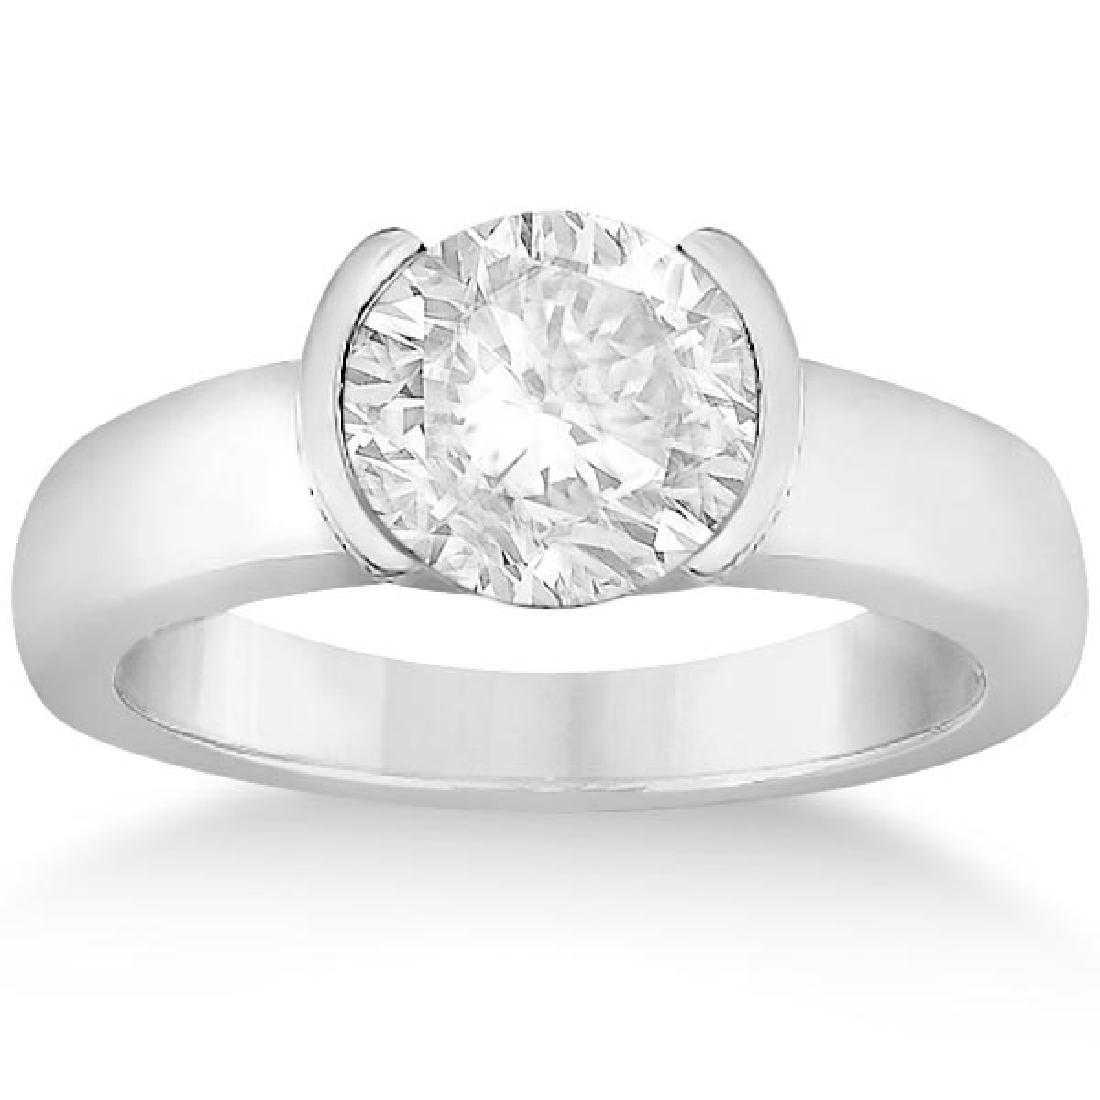 half-bezel setting - protective gem settings